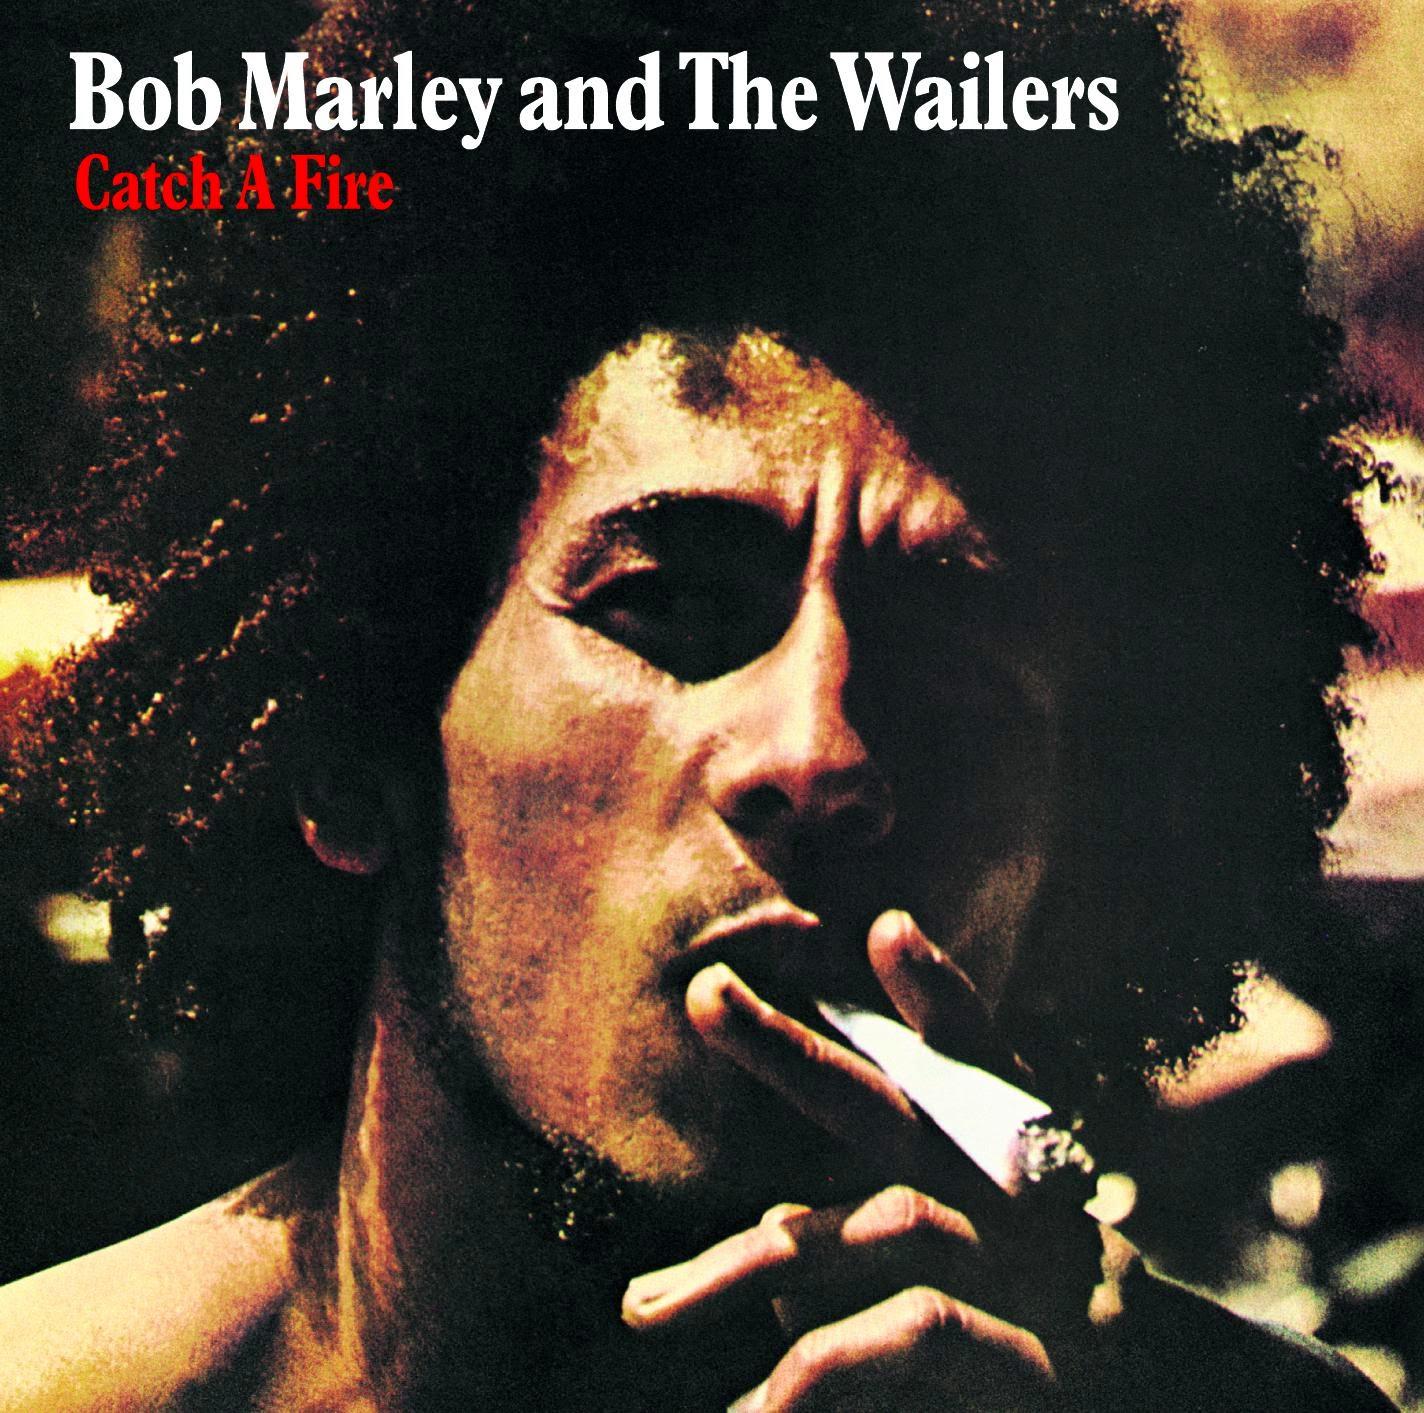 catch_a_fire_the_wailers_cd_bob_marley